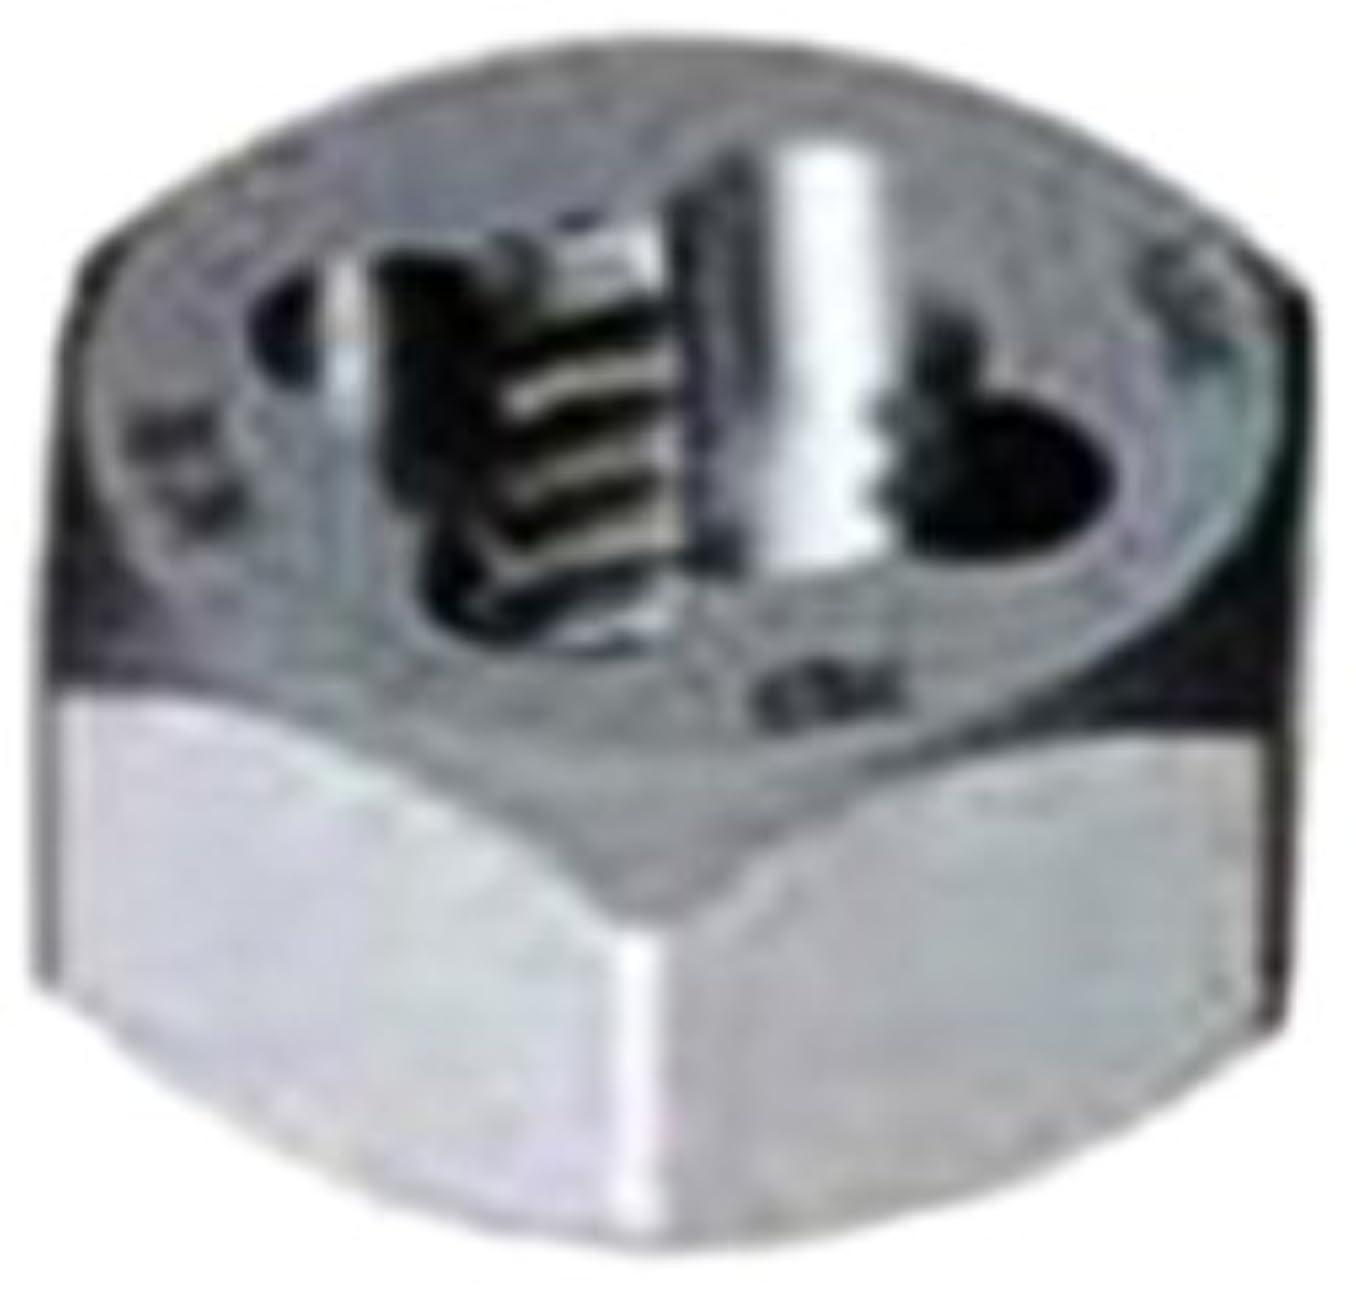 Gyros 92-91620 Metric Carbon Steel Hex Rethreading Die, 16mm x 2.00 Pitch